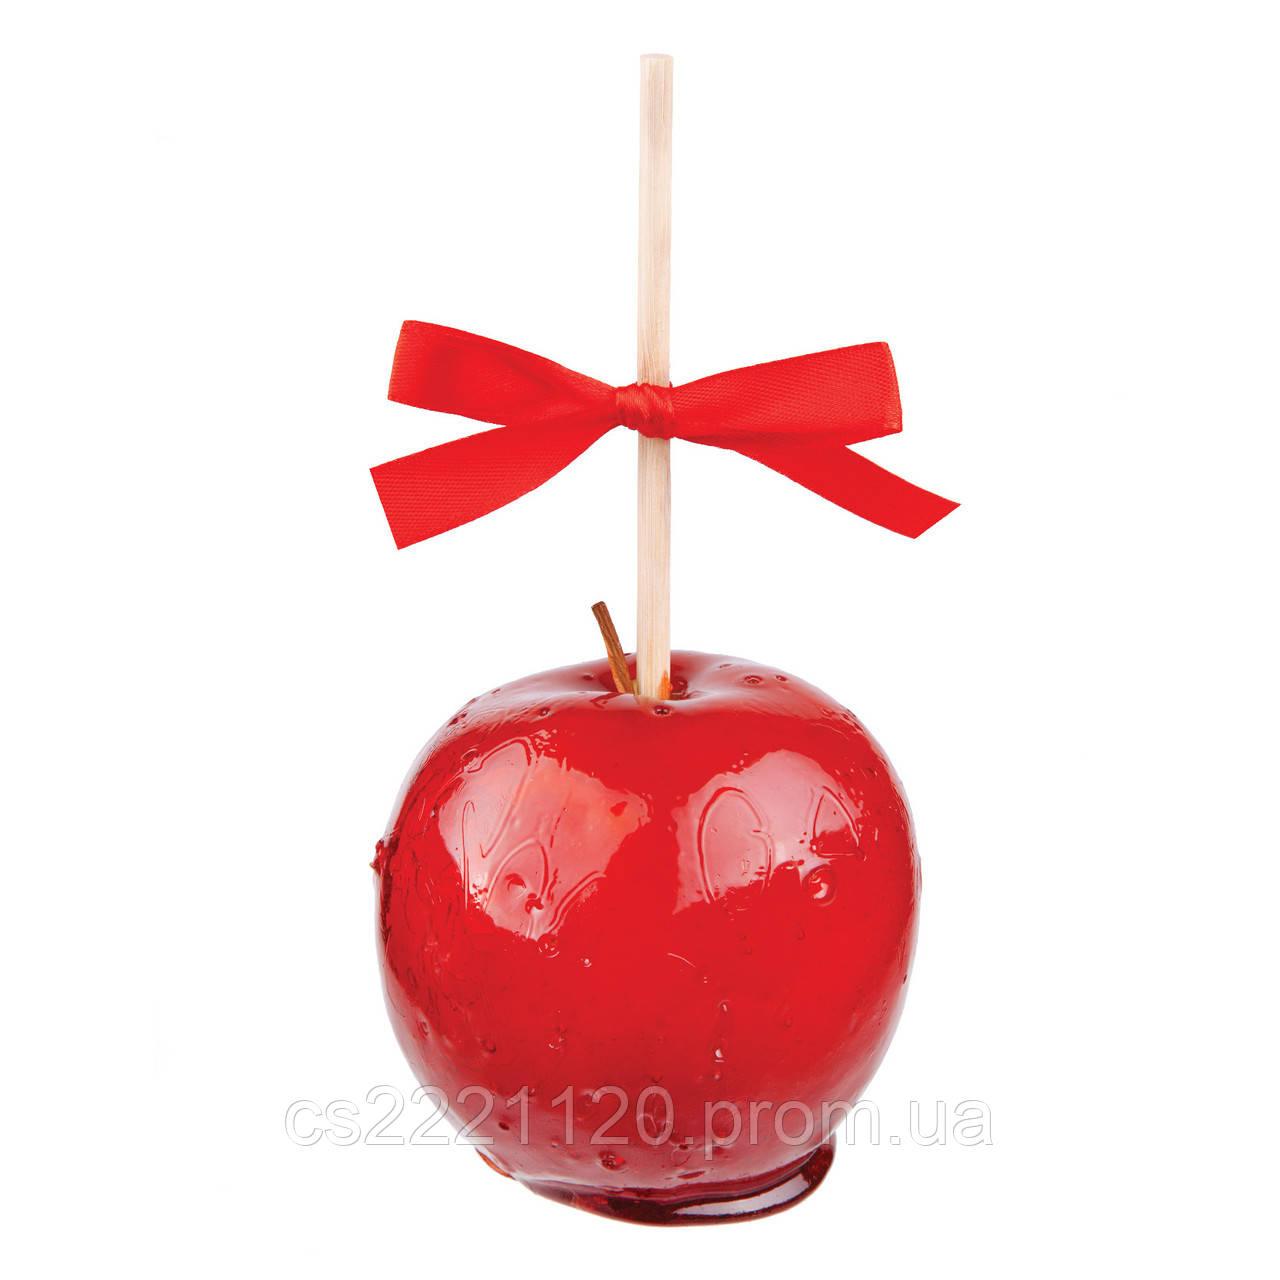 Ароматизатор TPA Apple Candy (Яблочная конфета) 5мл.